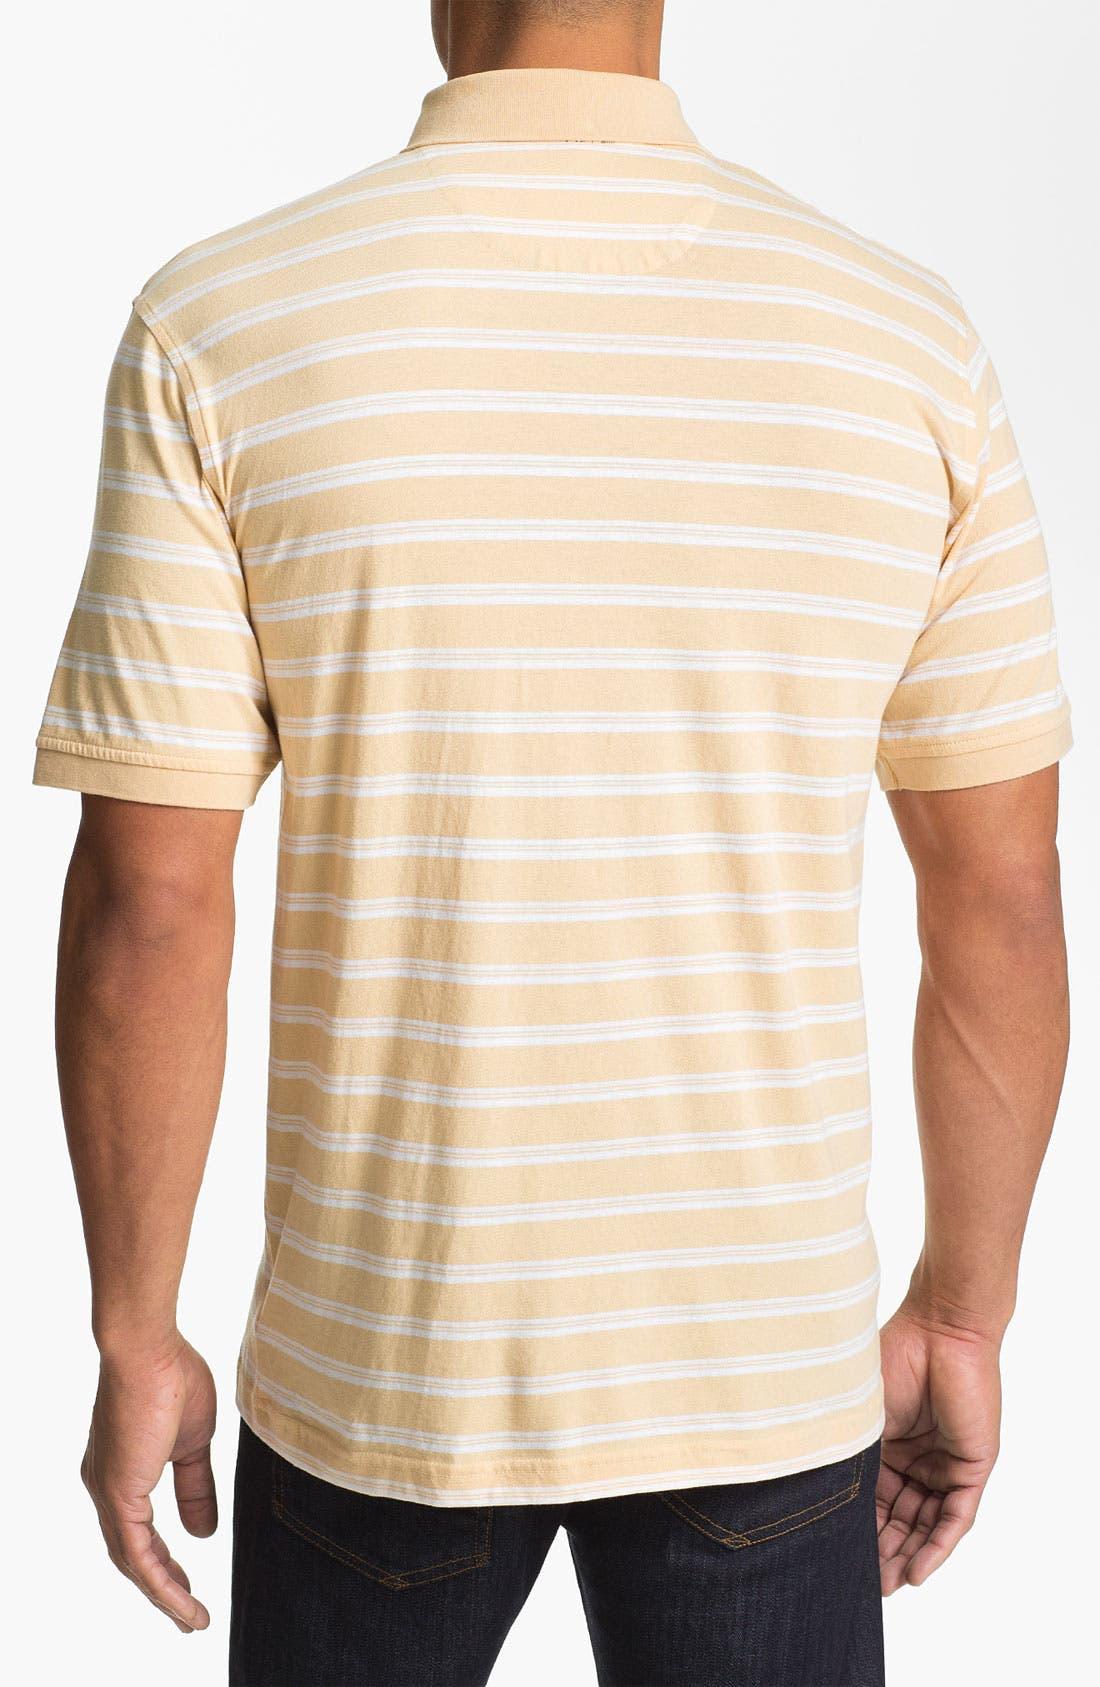 Alternate Image 2  - Cutter & Buck 'Woodlawn Stripe' Polo (Big & Tall)